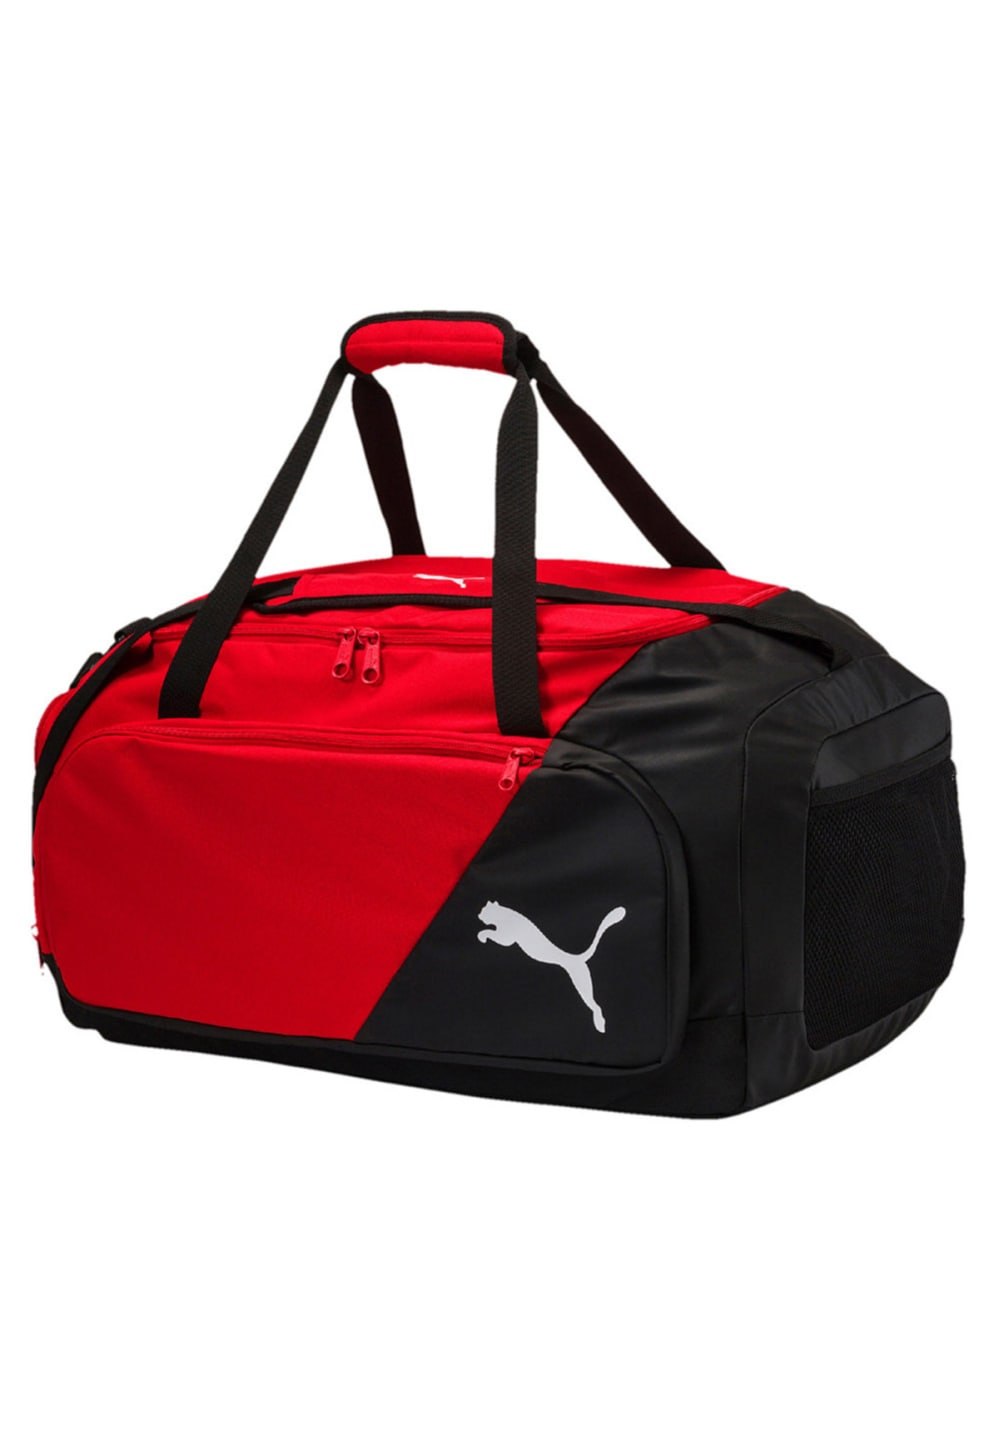 Puma LIGA Medium Bag Sporttaschen - Rot